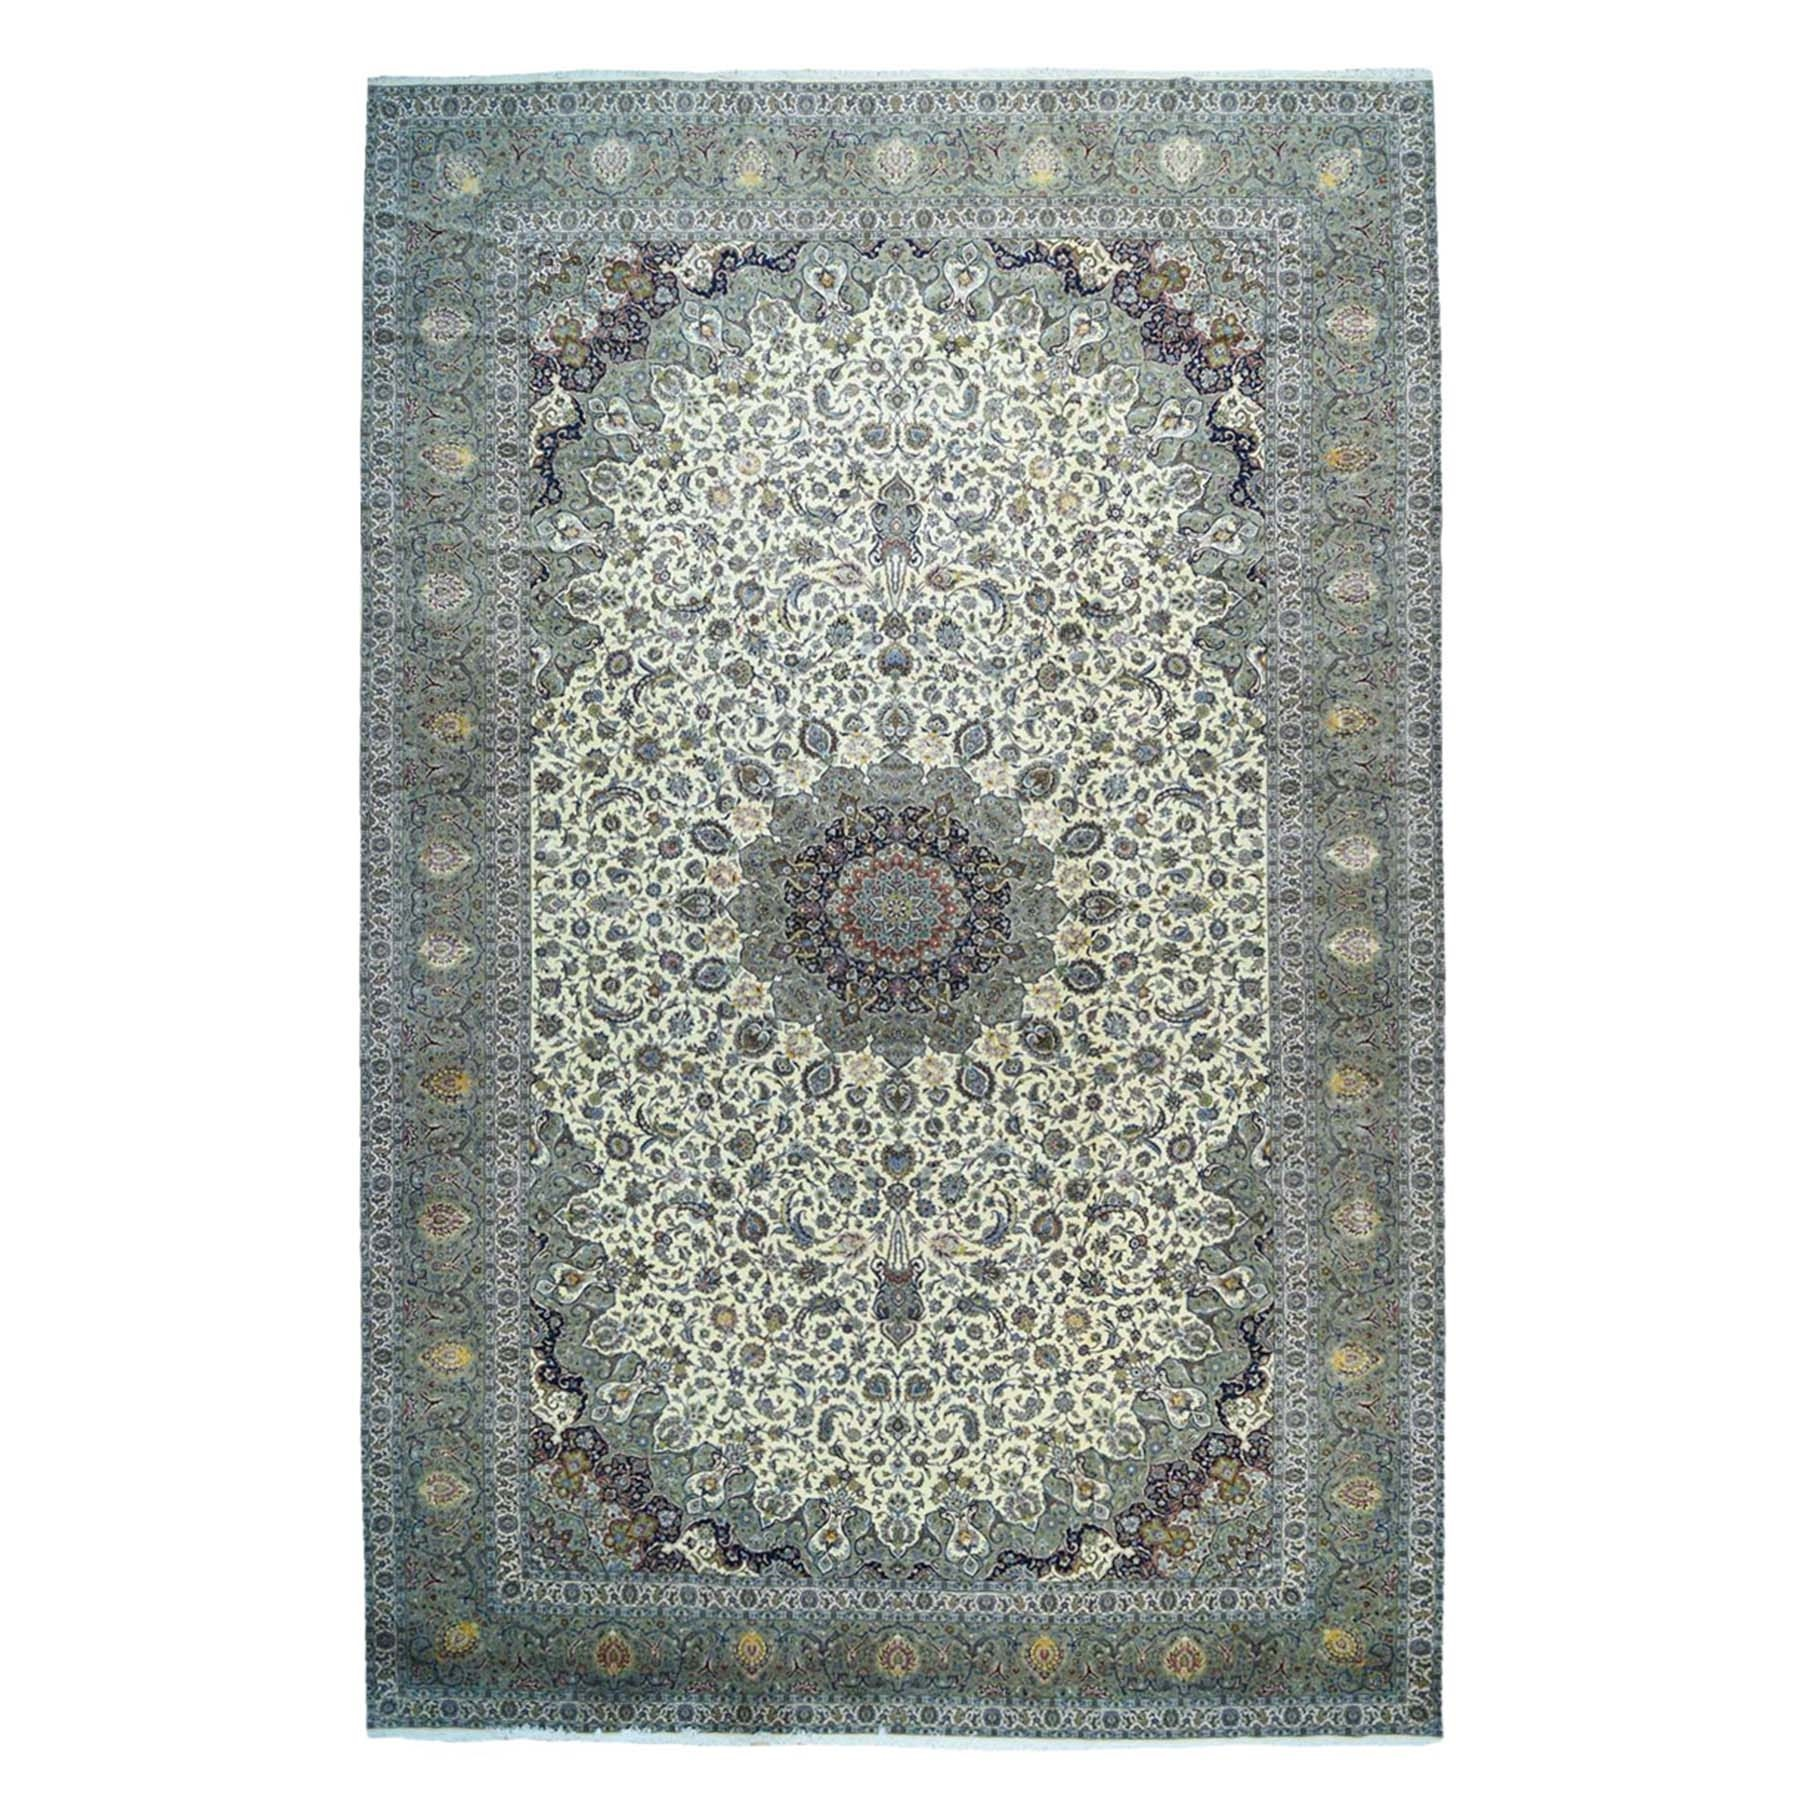 "16'5""x26' Oversize Persian Kashan Silk Flowers Sheikh Safi Design Rug"